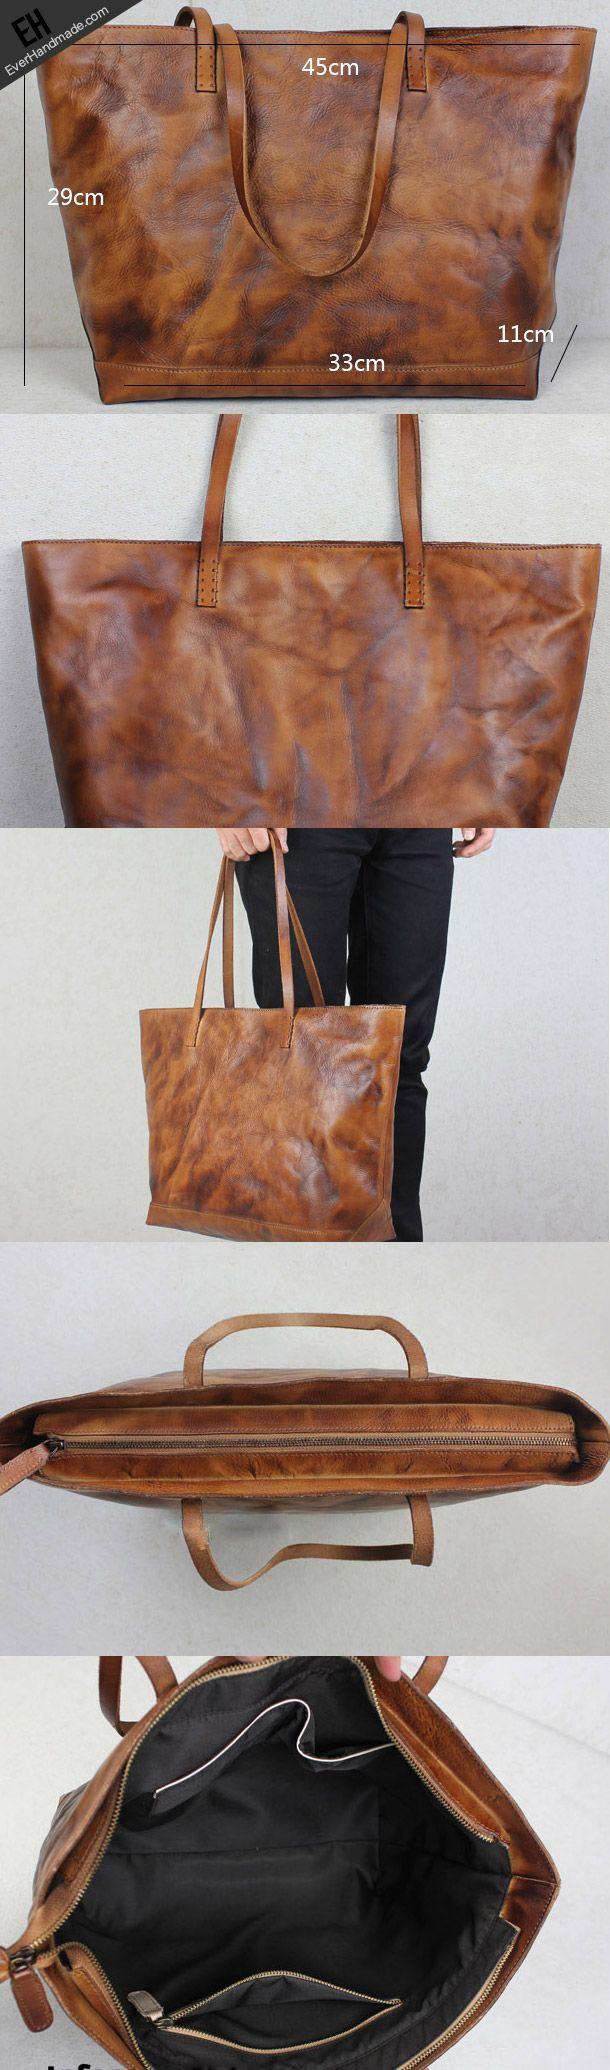 Handmade leather tote modern vintage leather large brown tan tote bag | EverHandmade